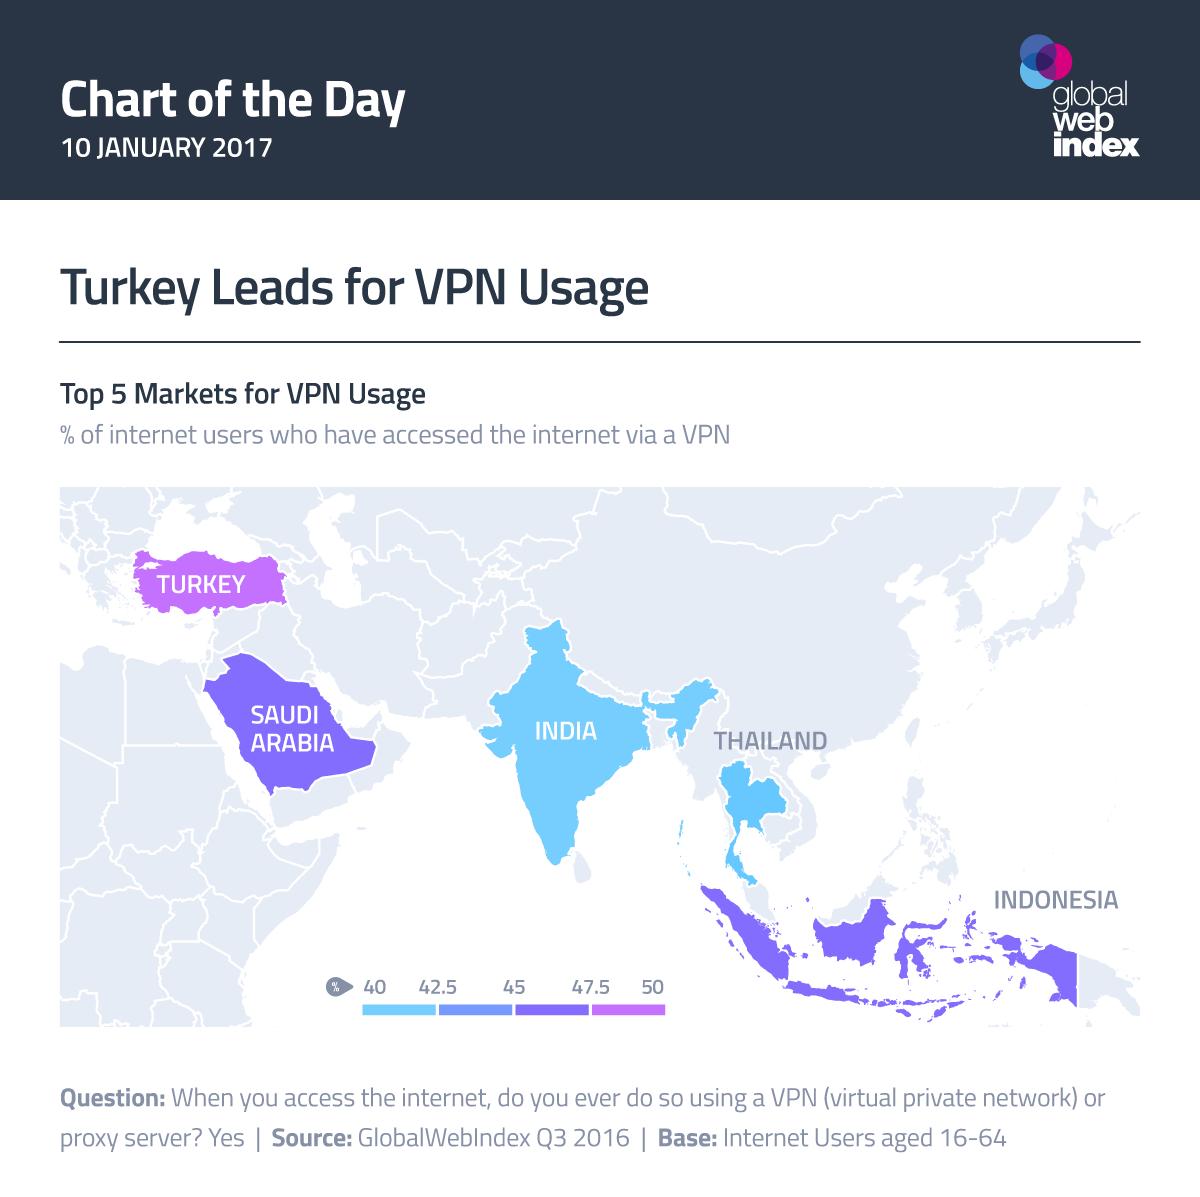 Turkey Leads for VPN Usage